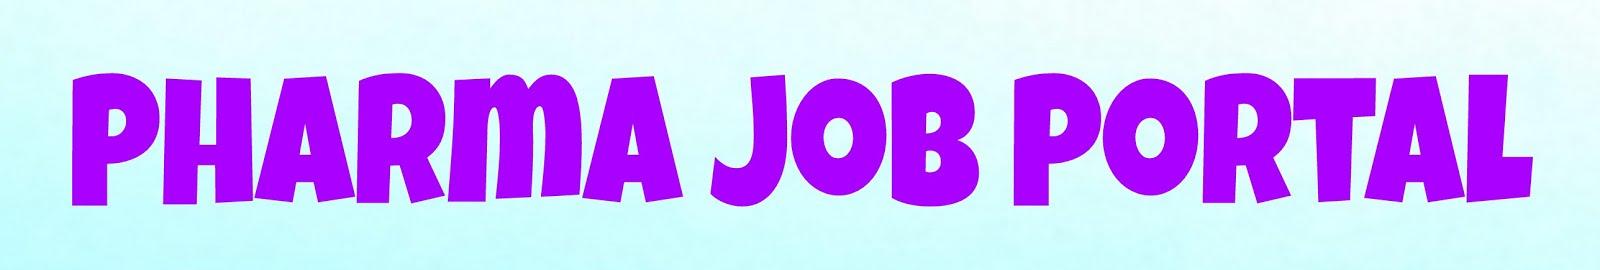 Pharma Job Portal